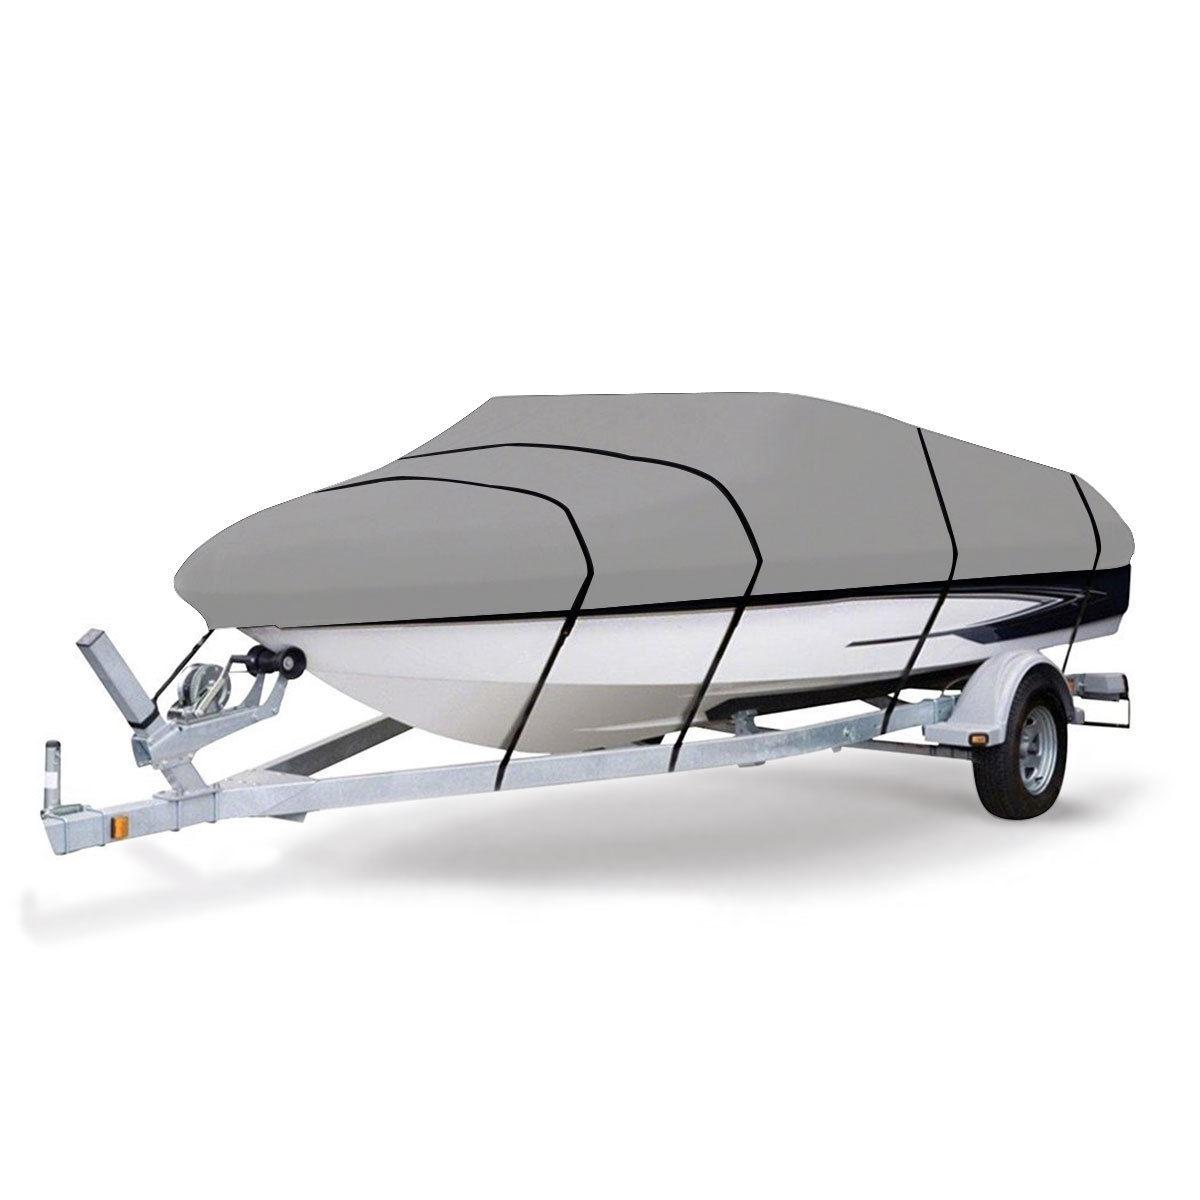 Heavy Duty 600D Marine Grade Polyester Canvas Trailerable Waterproof Boat Cover